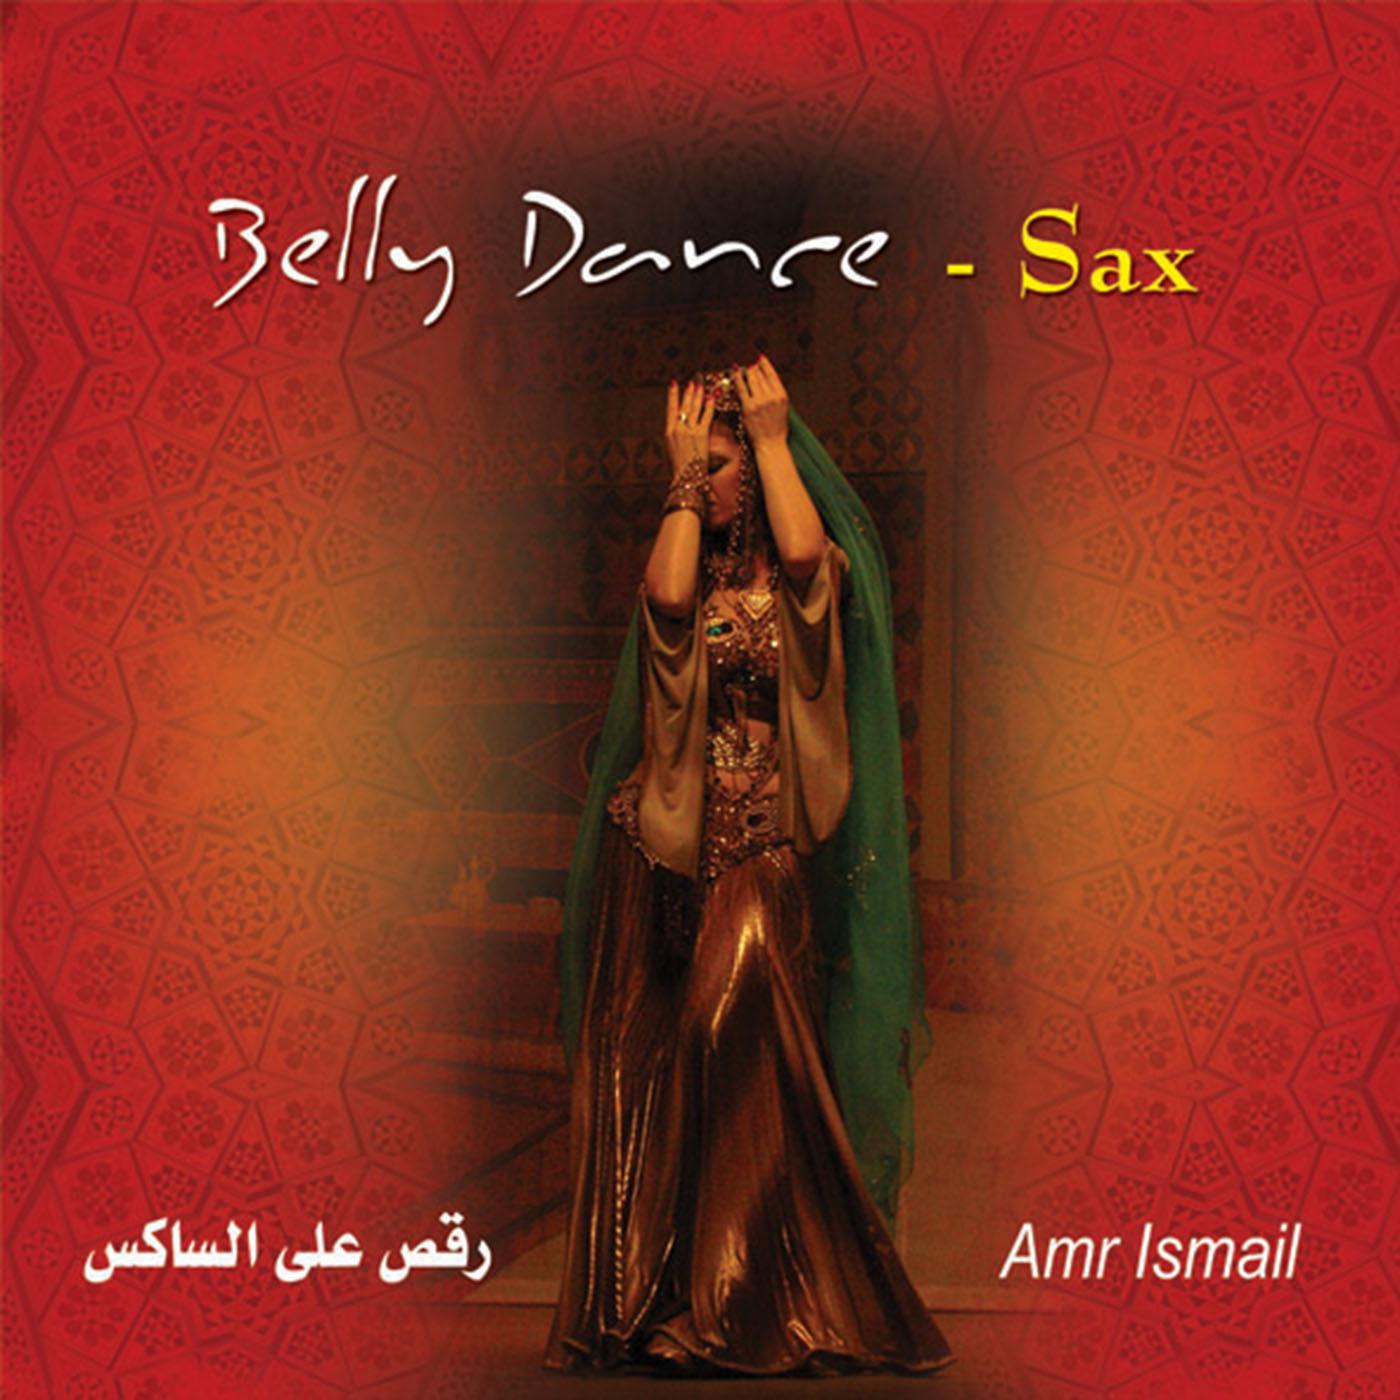 Raks Al Sax/  Amr Ismail    BUY IT